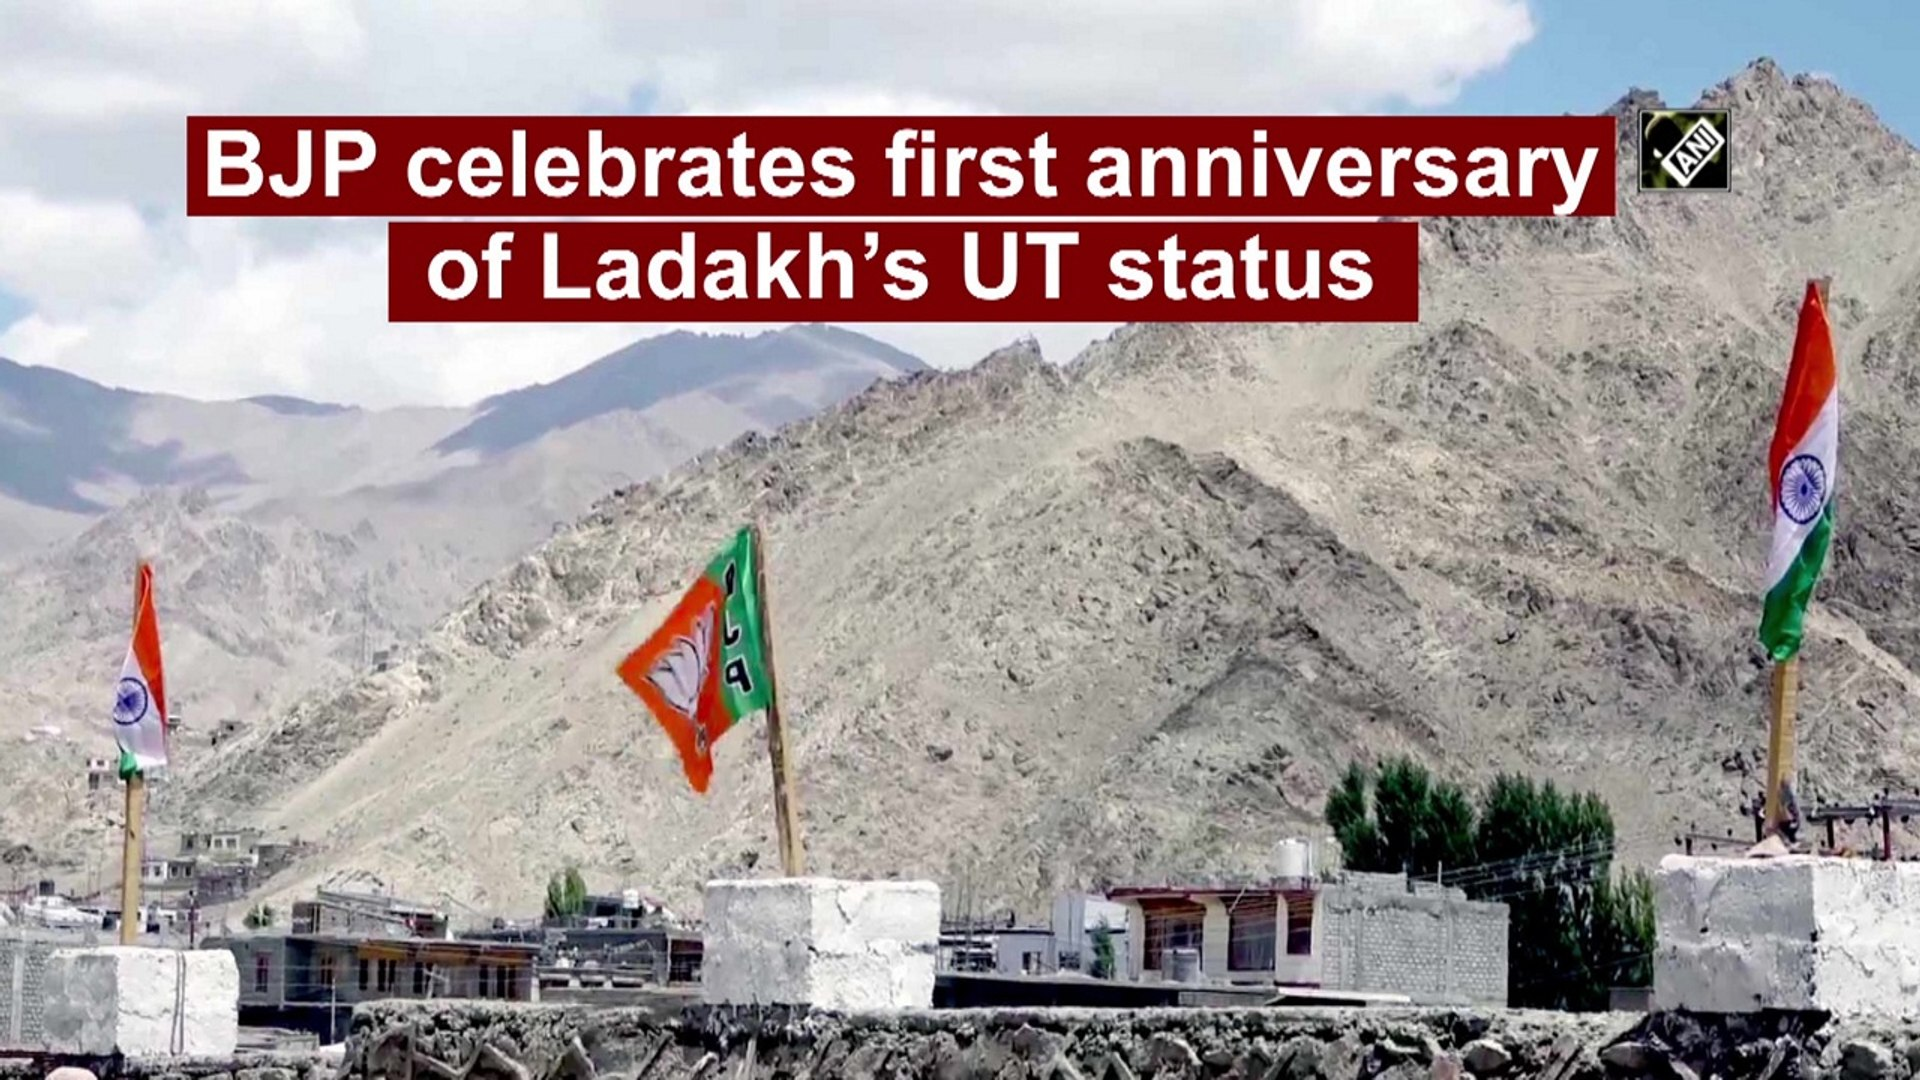 BJP celebrates first anniversary of Ladakh's UT status